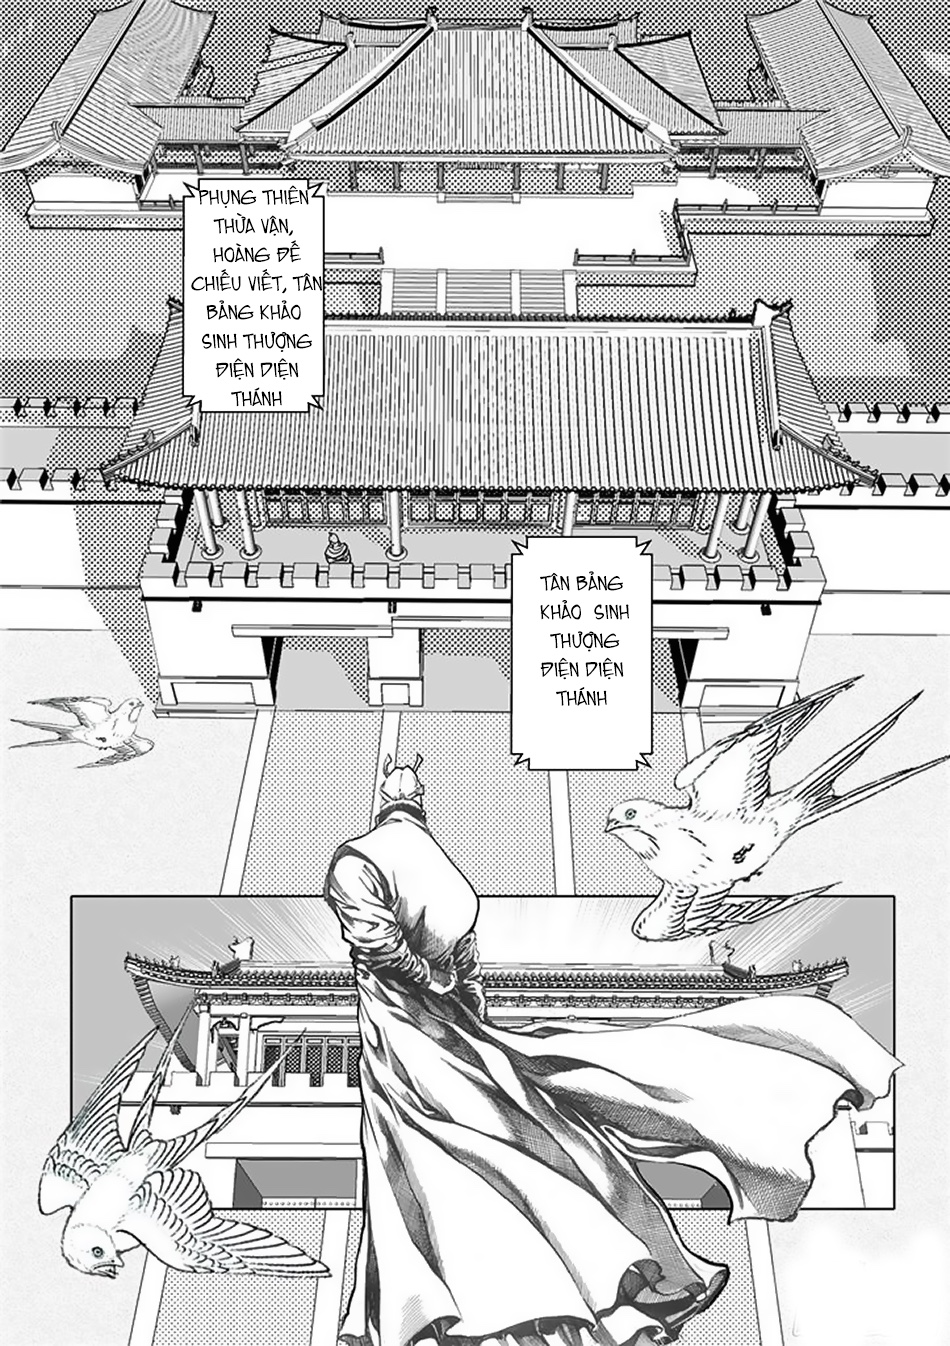 Chung Quỳ Truyền Kỳ Chapter 53 - Hamtruyen.vn